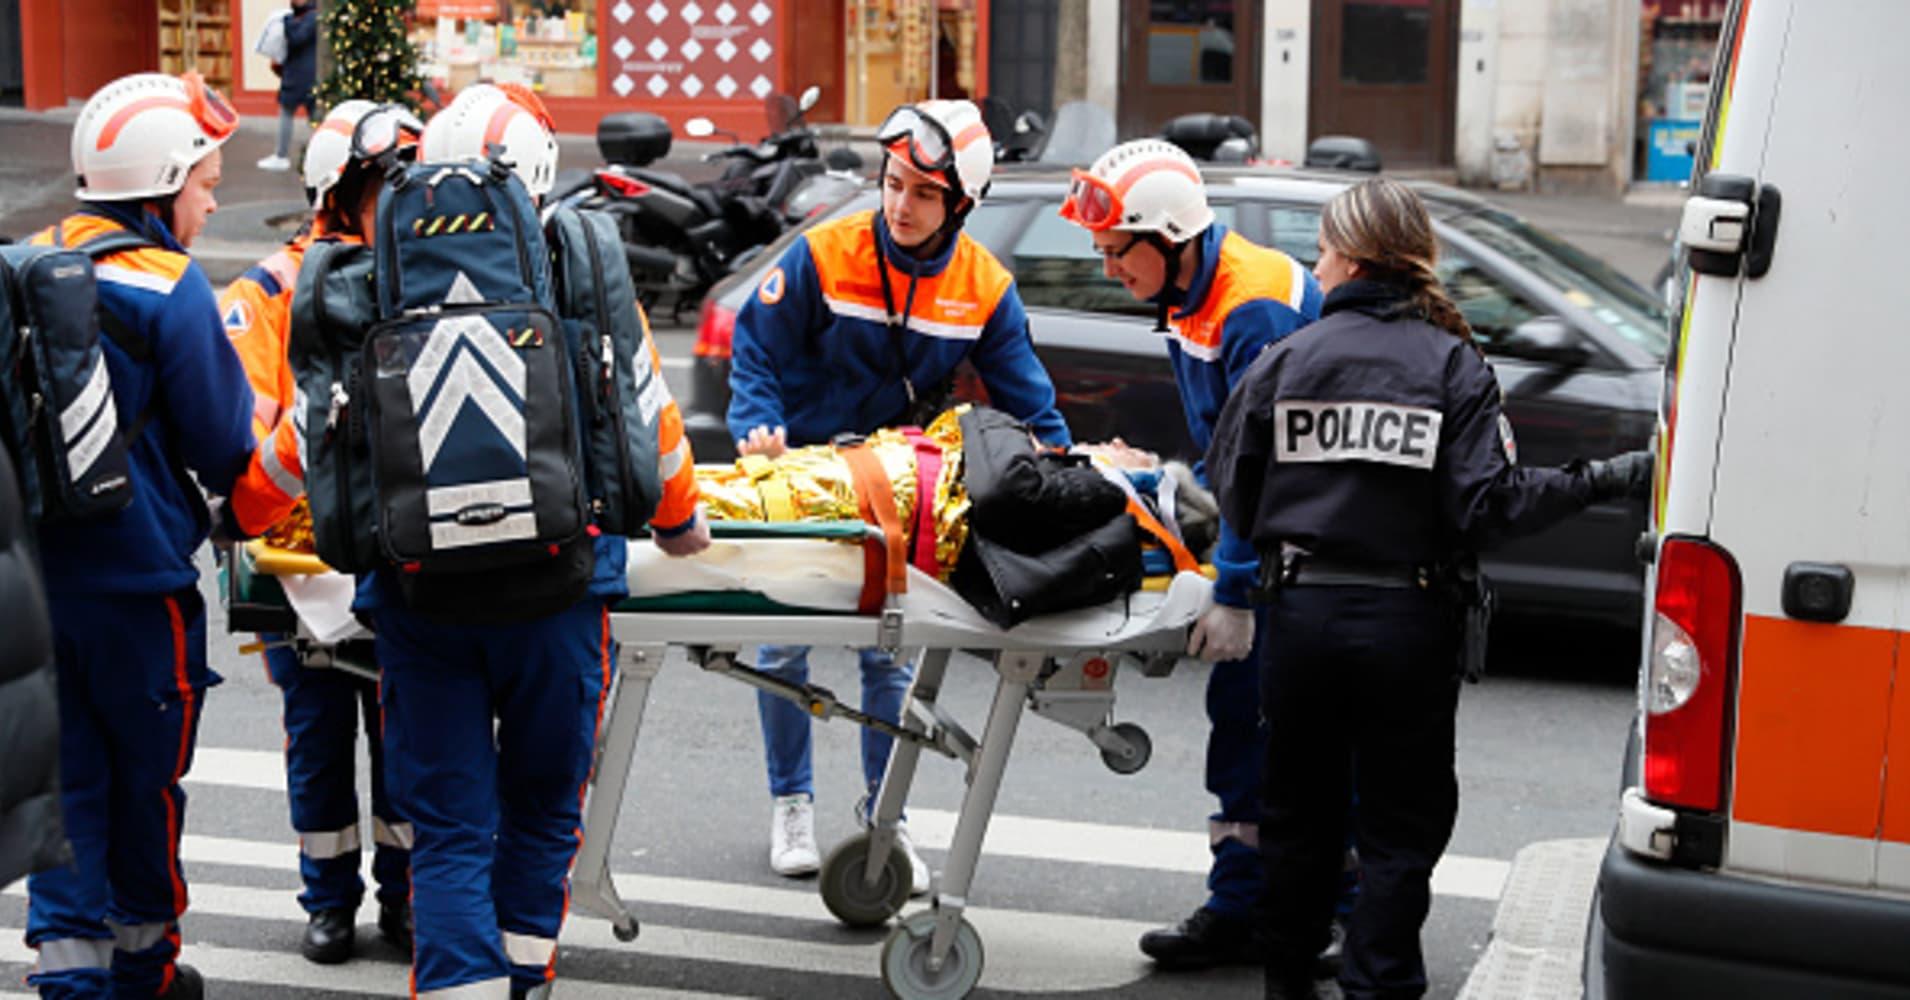 Paris gas leak explosion leaves 4 dead, dozens wounded amid 'yellow vest' protests